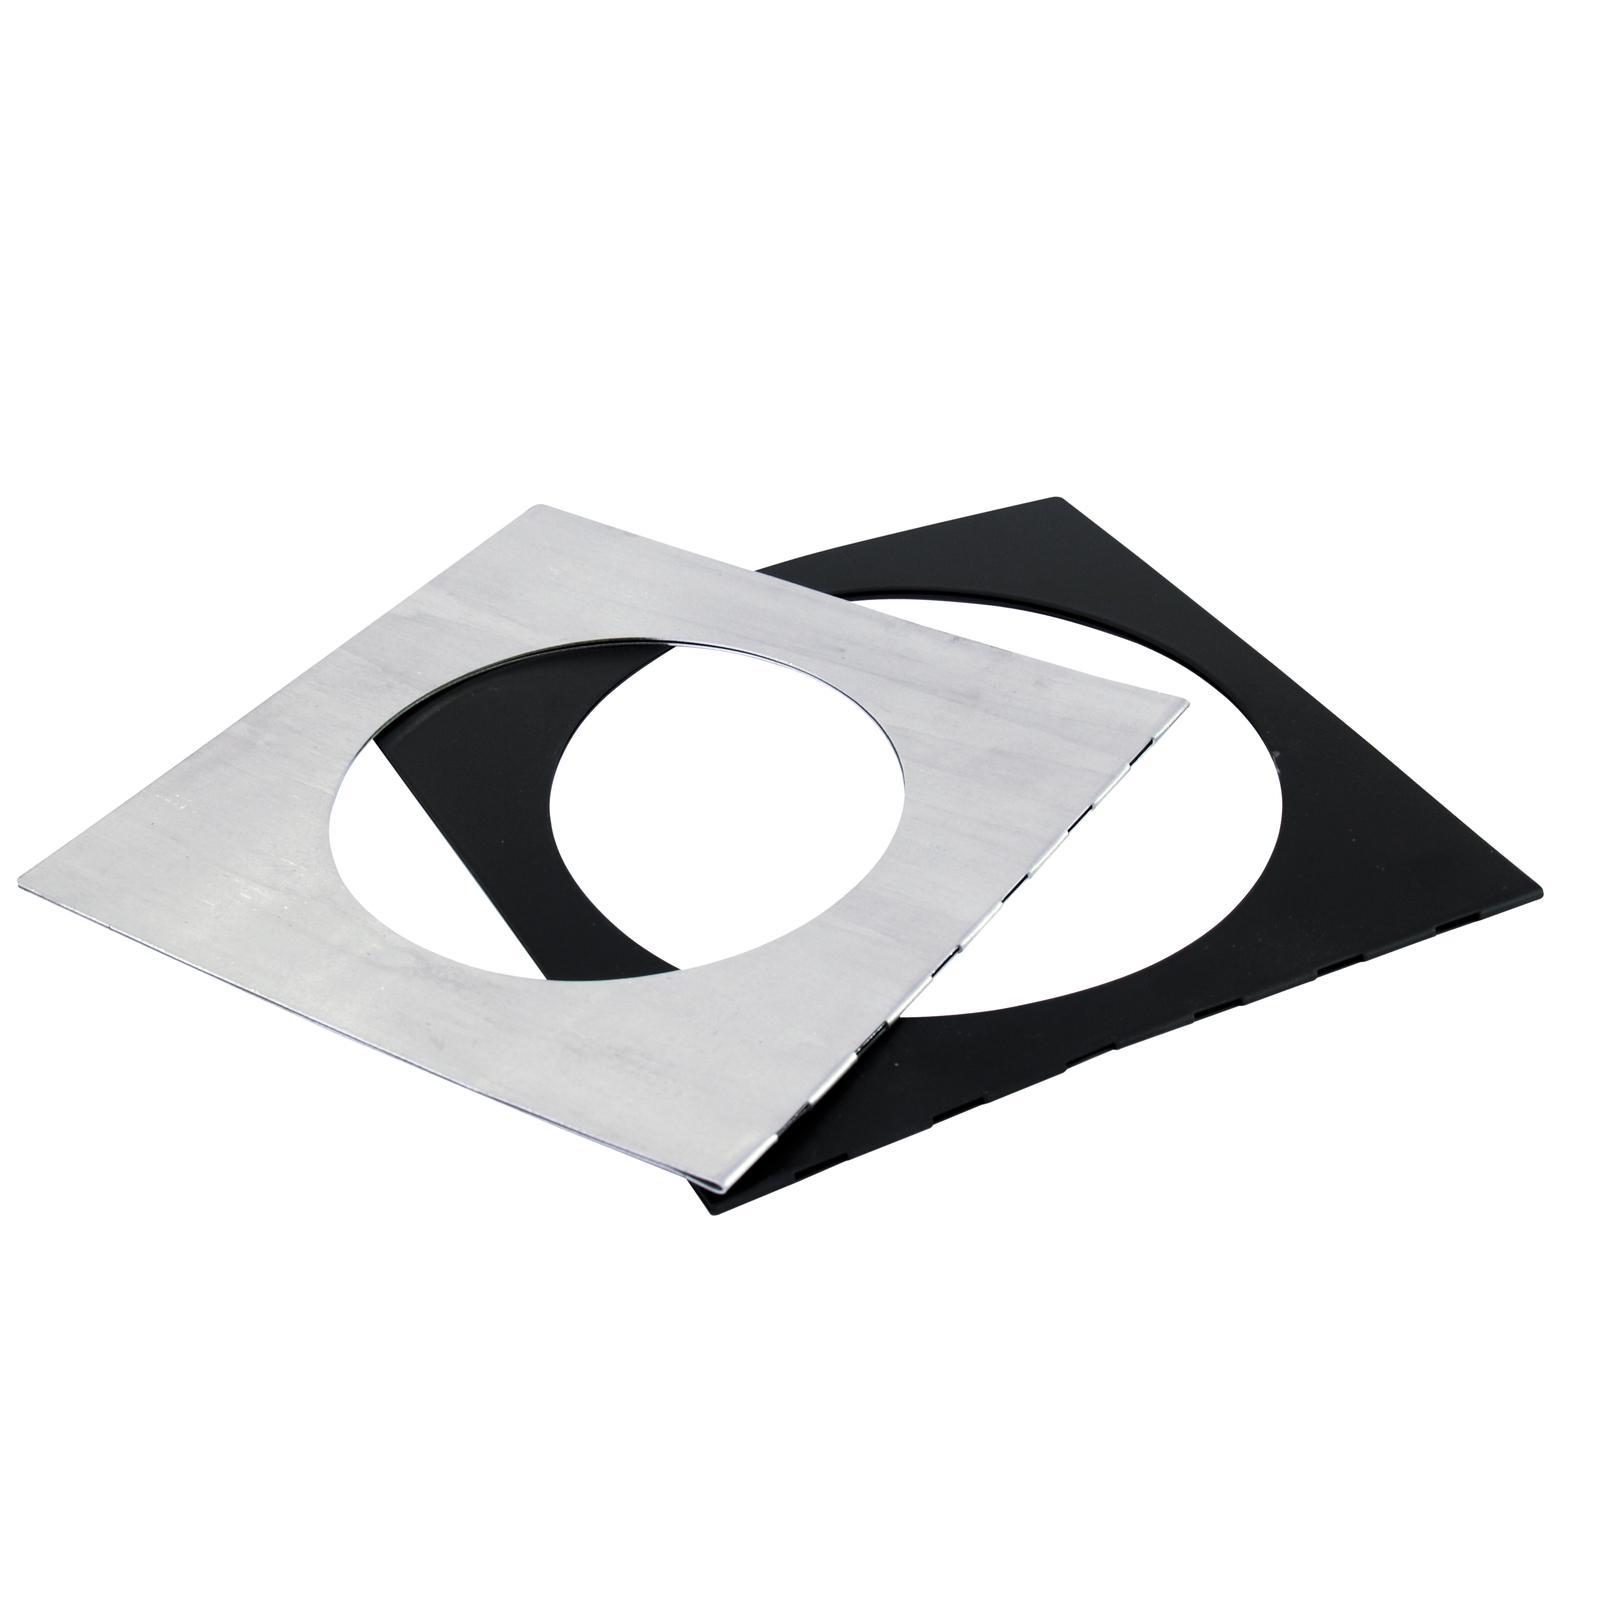 EUROLITE Filter frame PAR-38 Spot sil